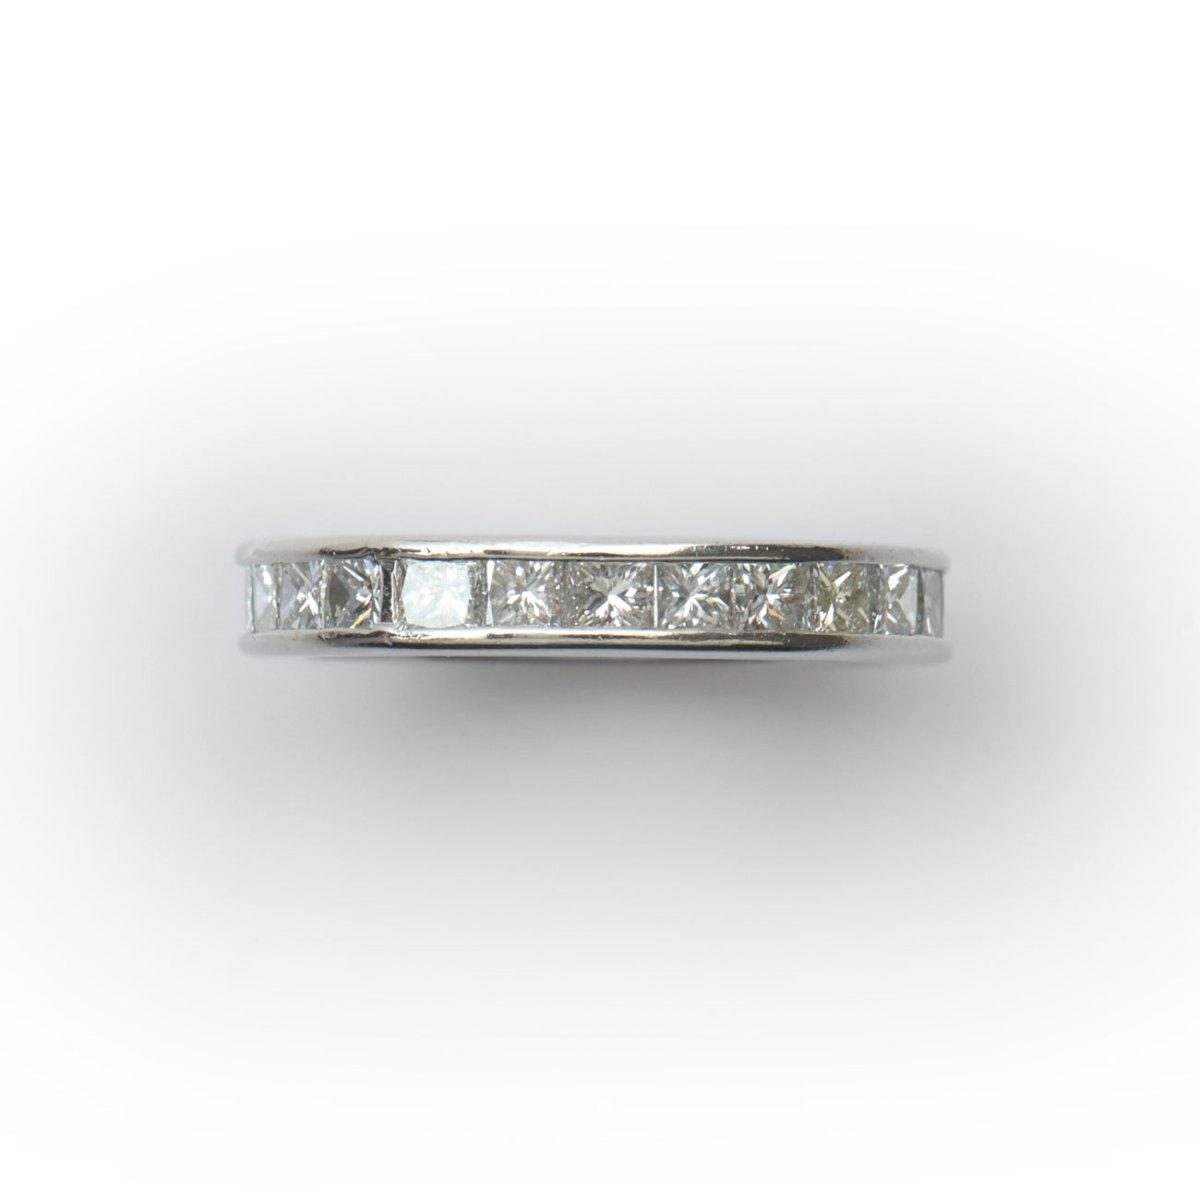 Princess diamonds wedding band in platinum, Size 7, Ref. BA-B18930 | EVENOR Jewelry • Brand new and vintage jewelry